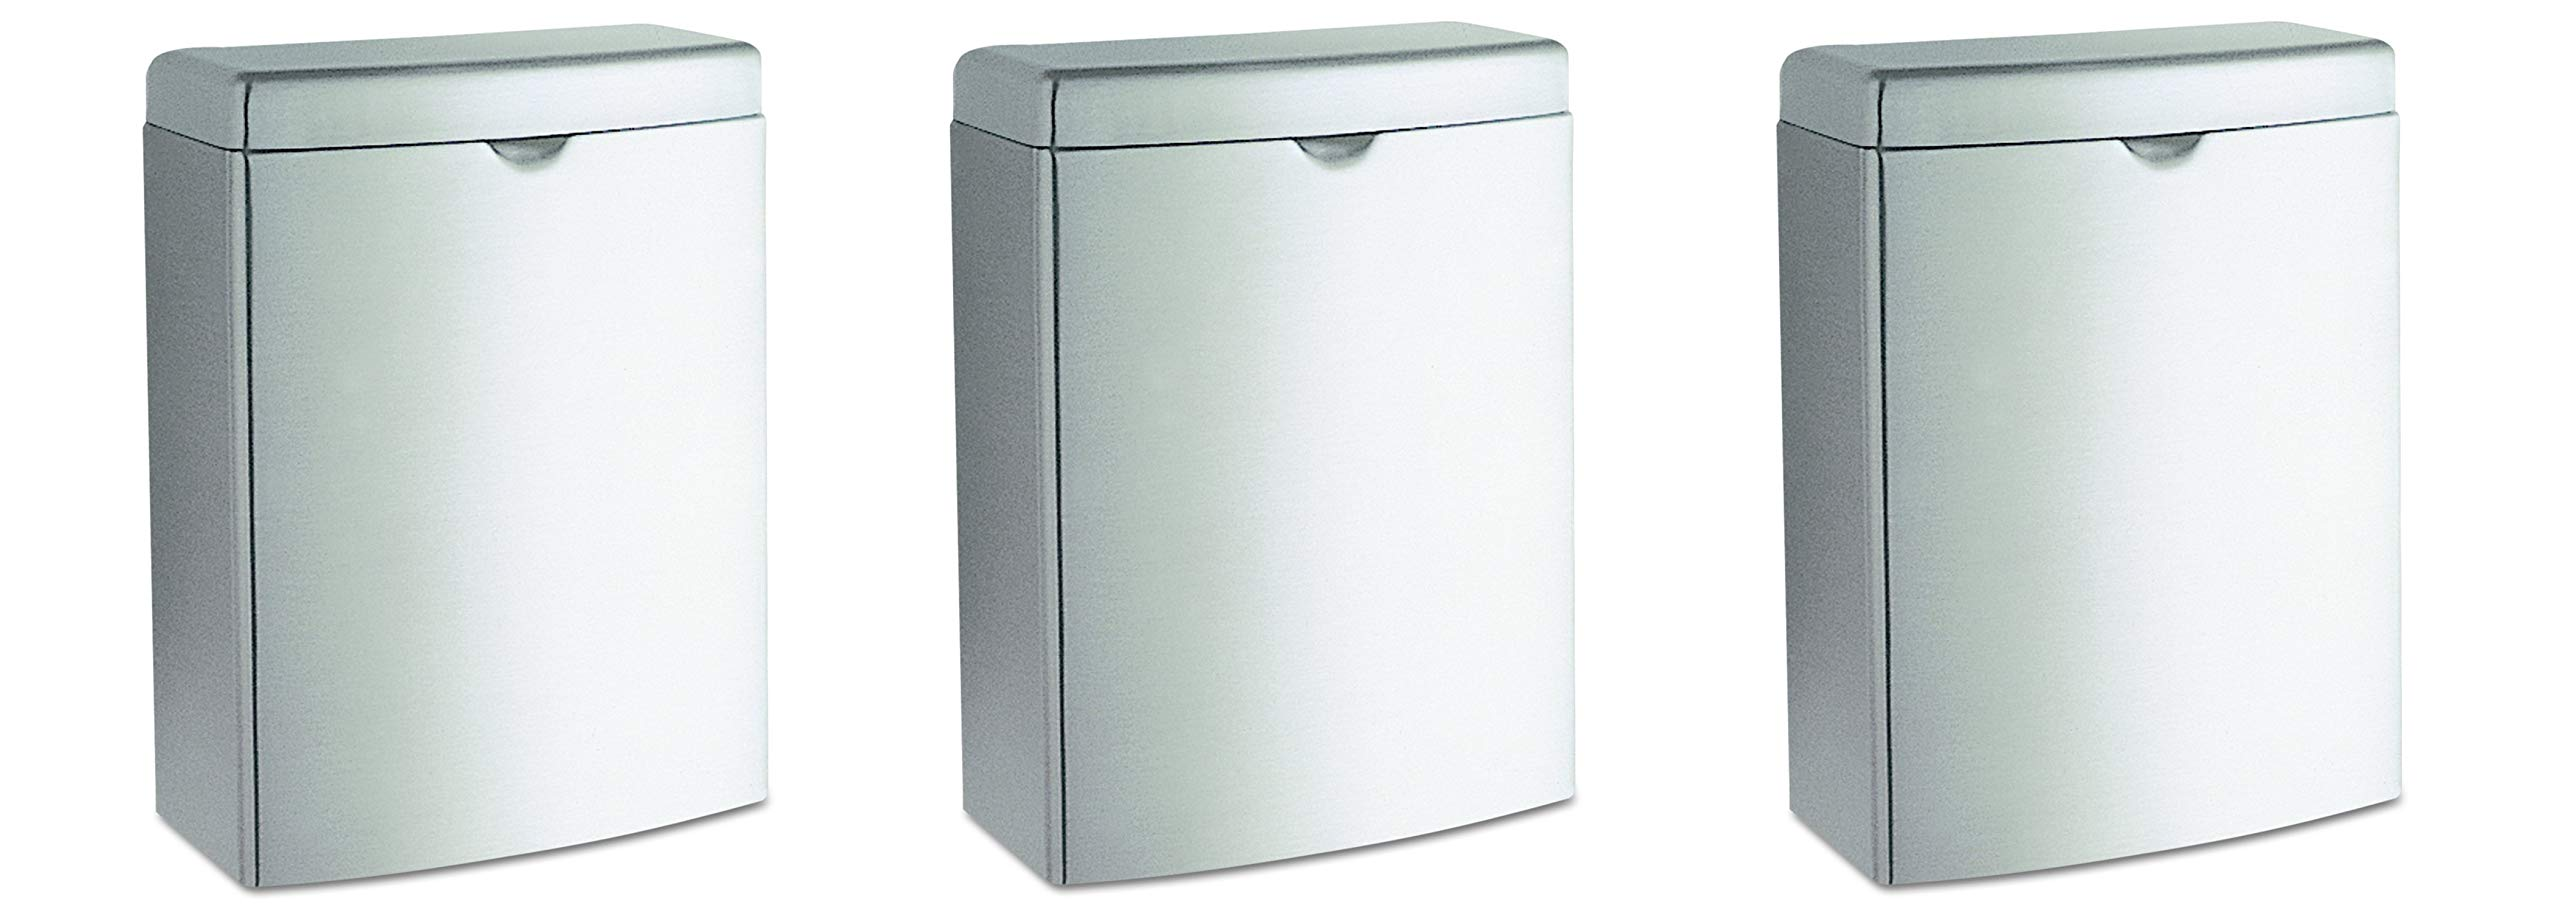 Bobrick 270 Contura Sanitary Napkin Receptacle, Rectangular, Stainless Steel, 1gal (Pack of 3)